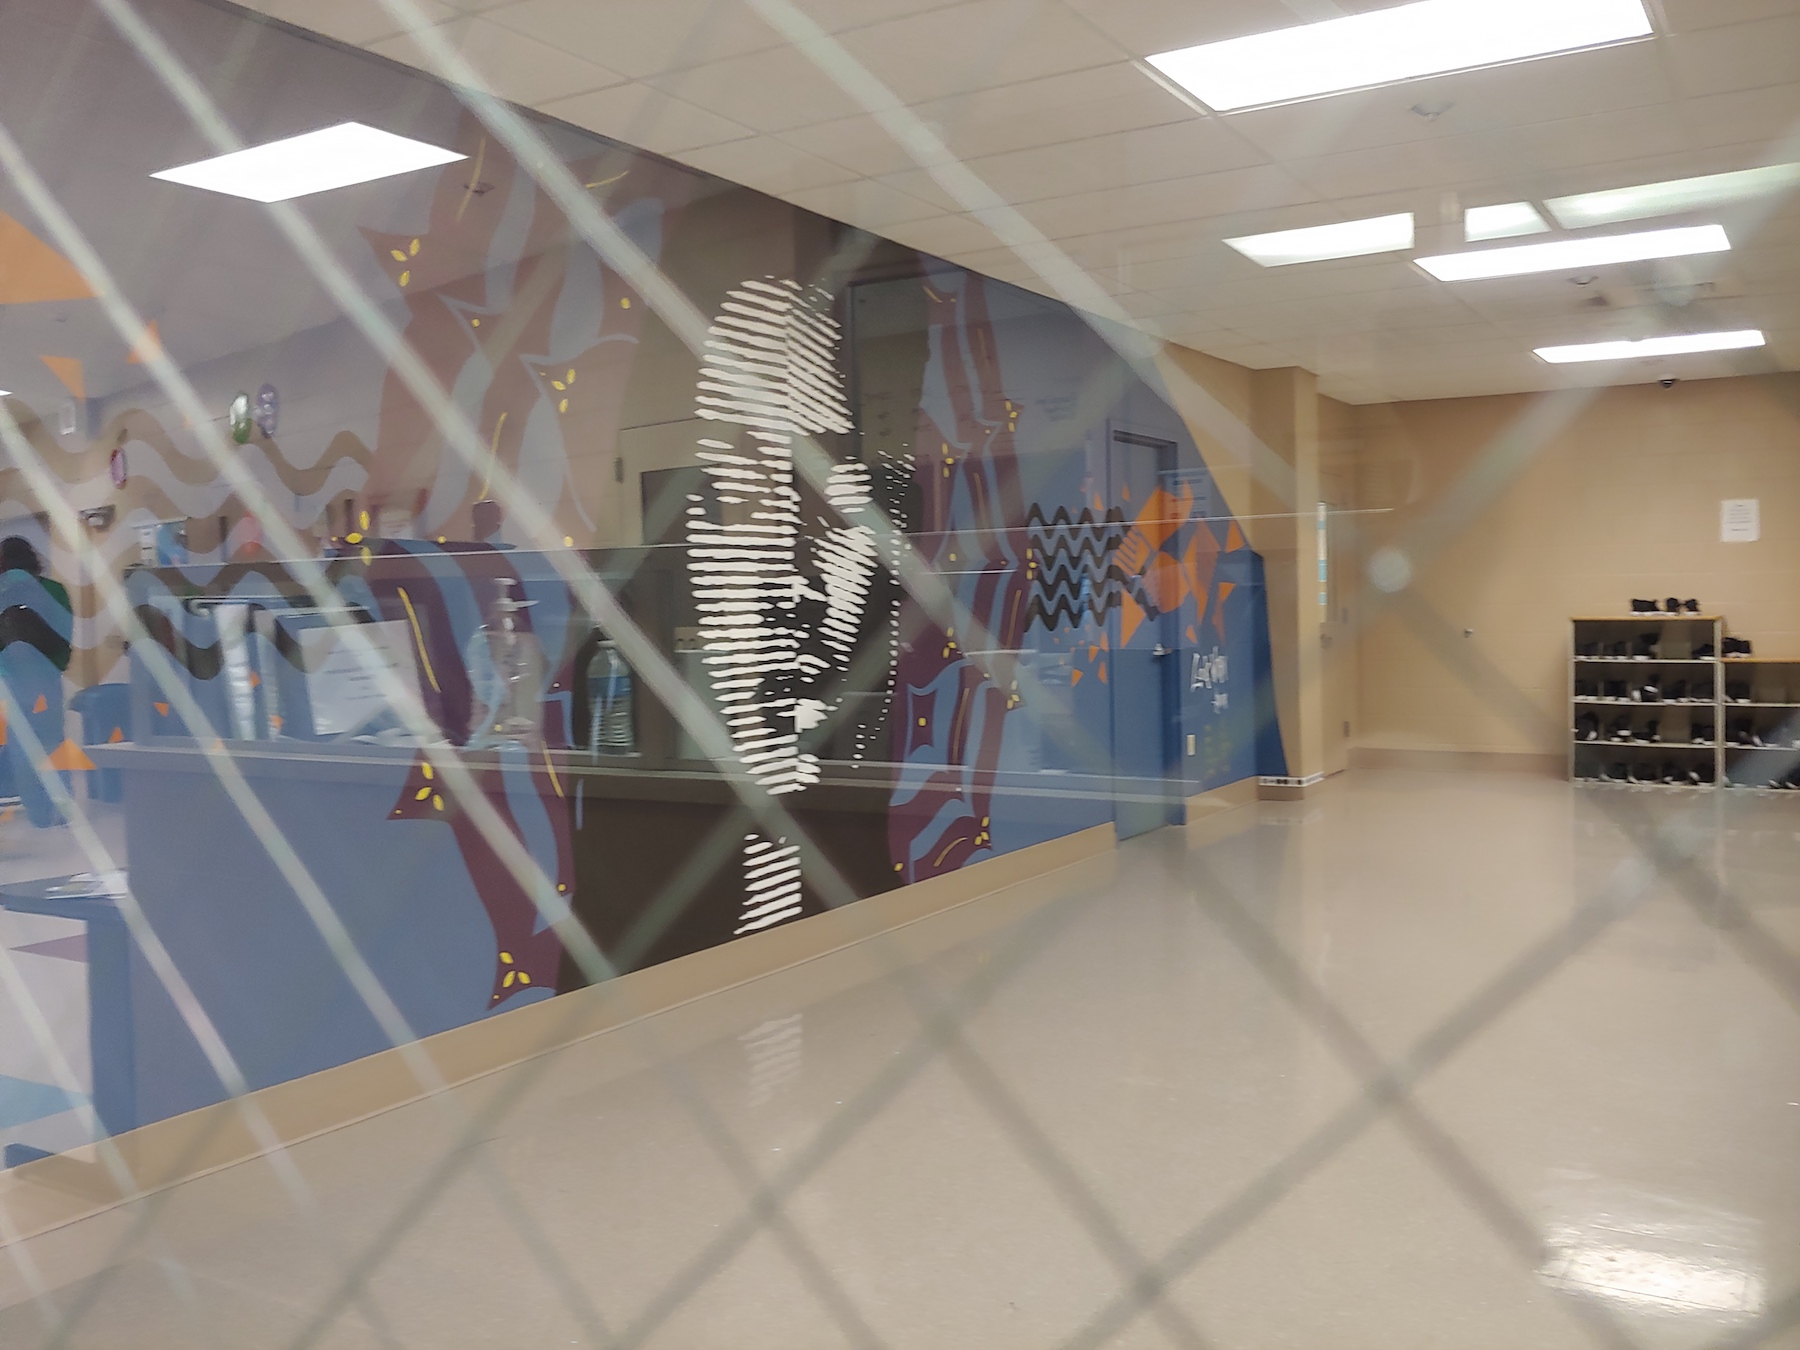 Detention Center Mural Doorway Audifax.jpg